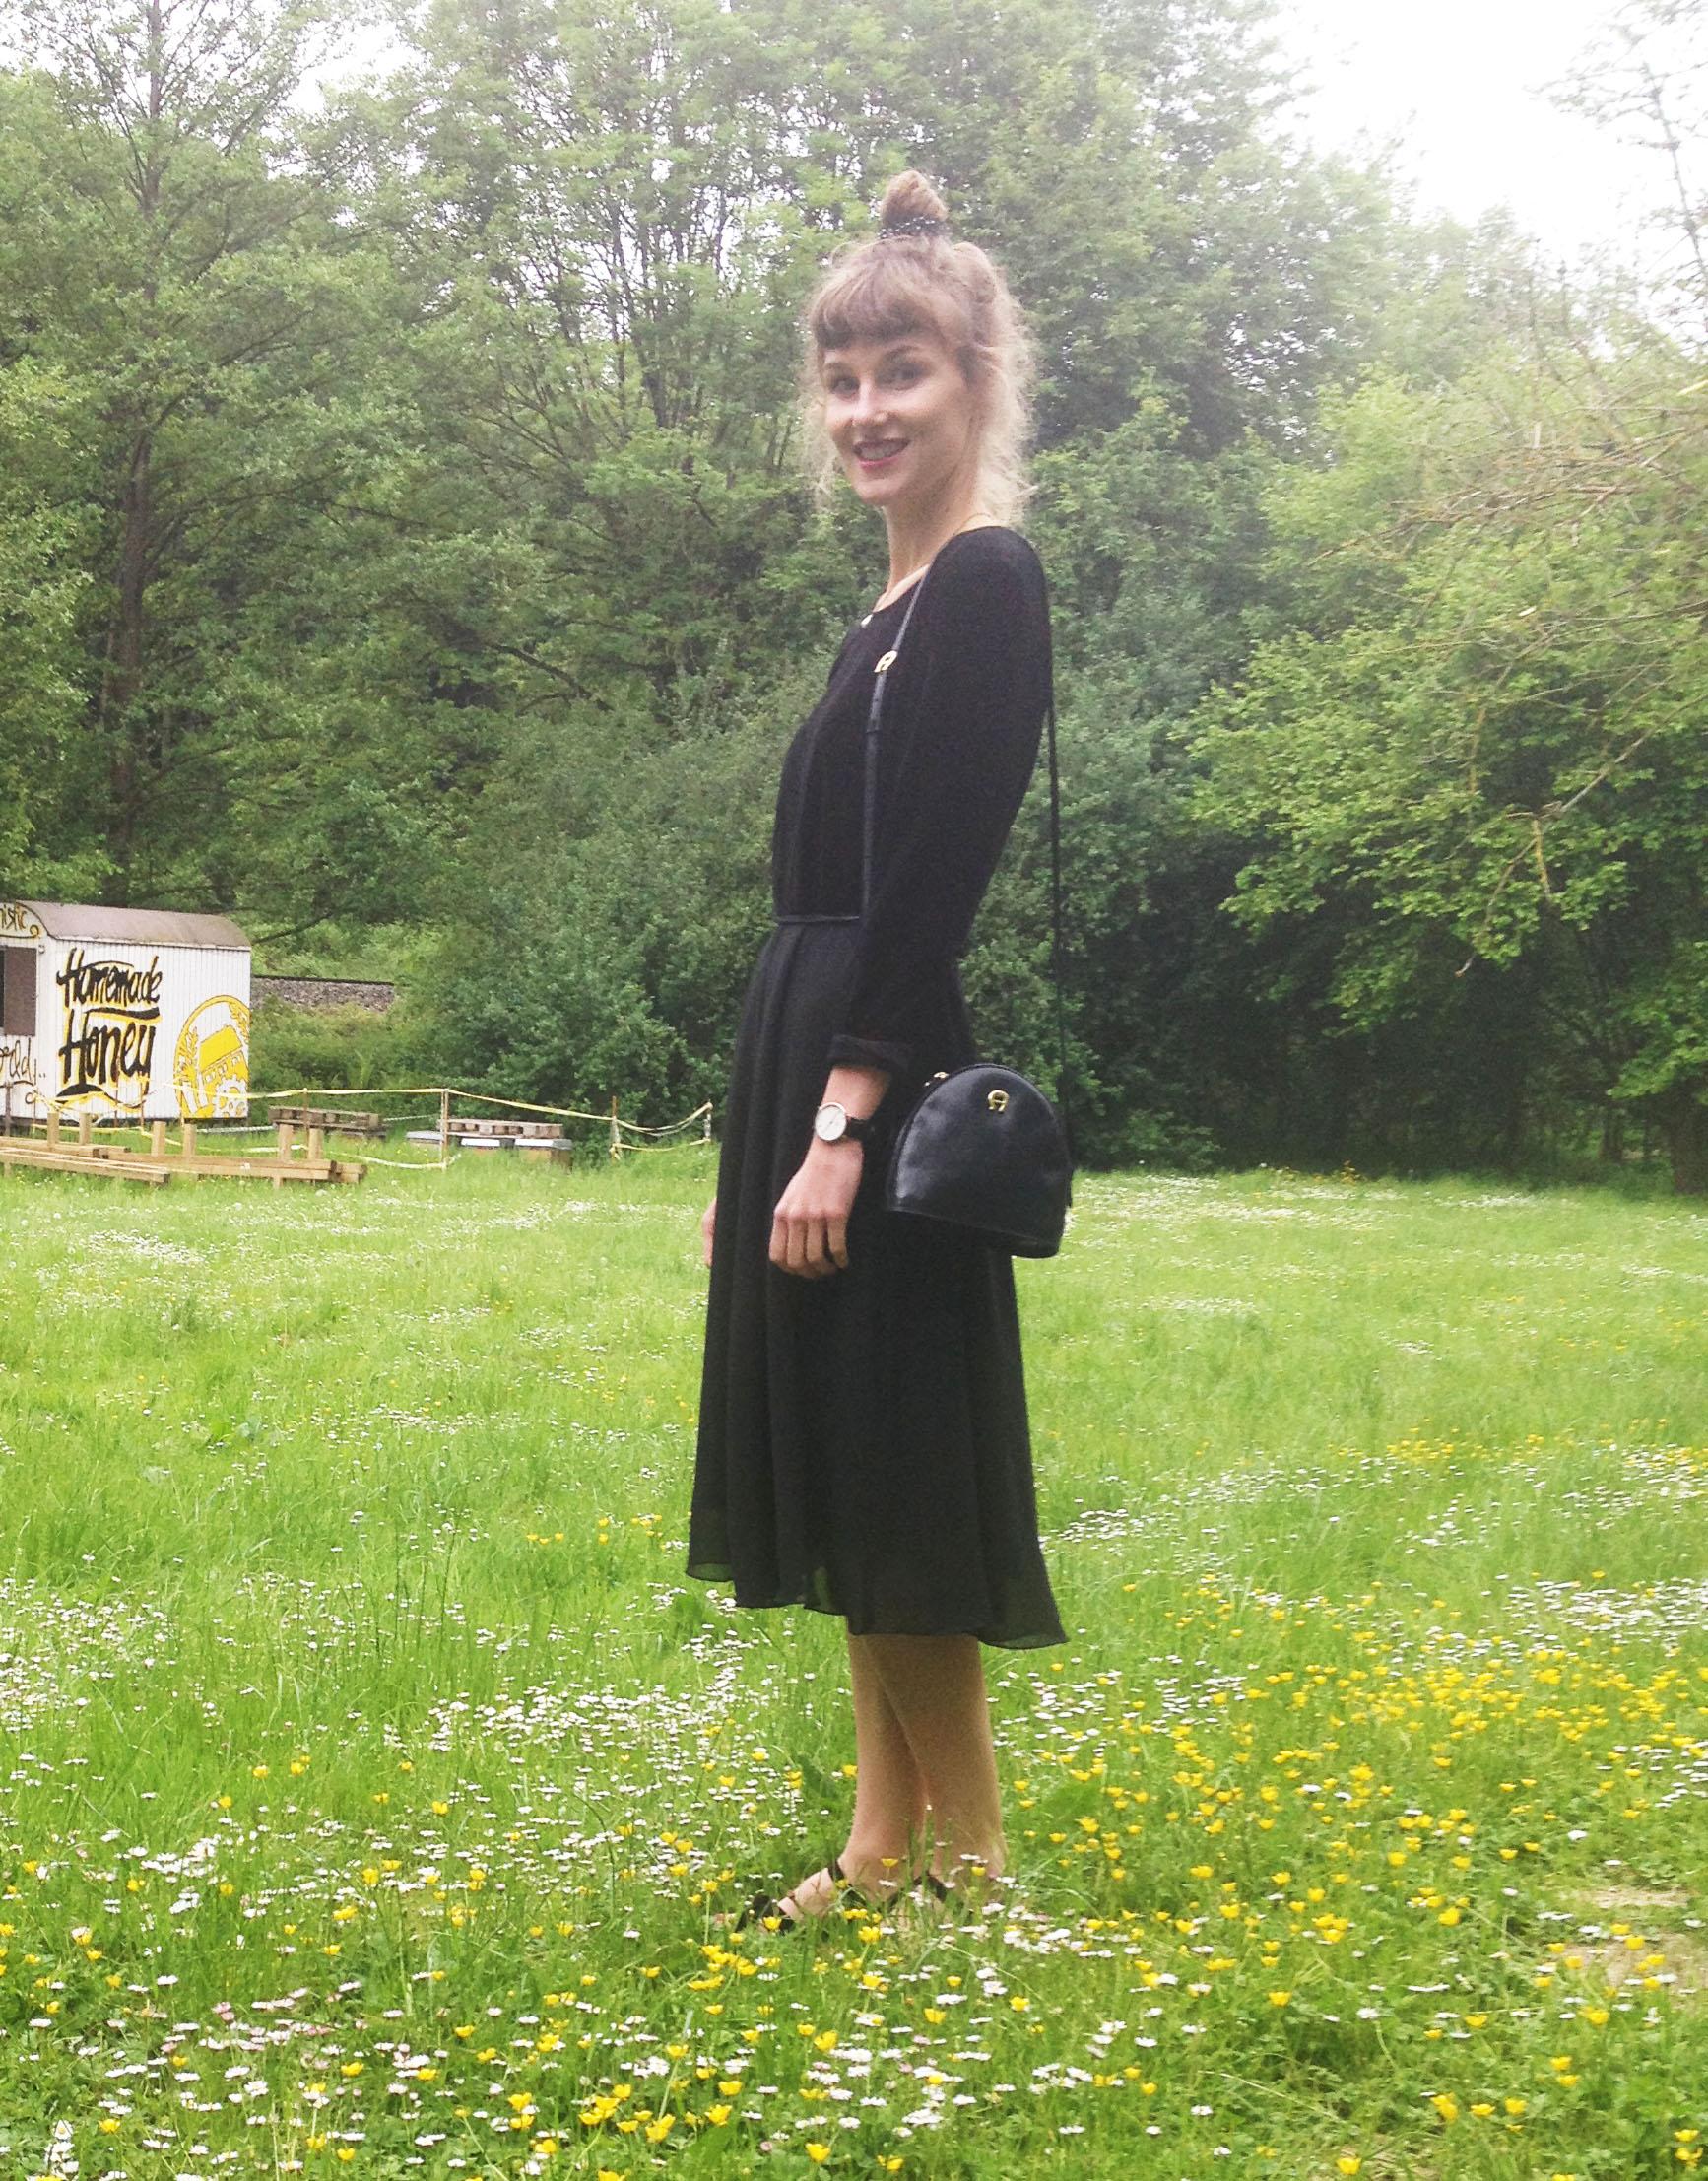 outfit lady in black. Black Bedroom Furniture Sets. Home Design Ideas